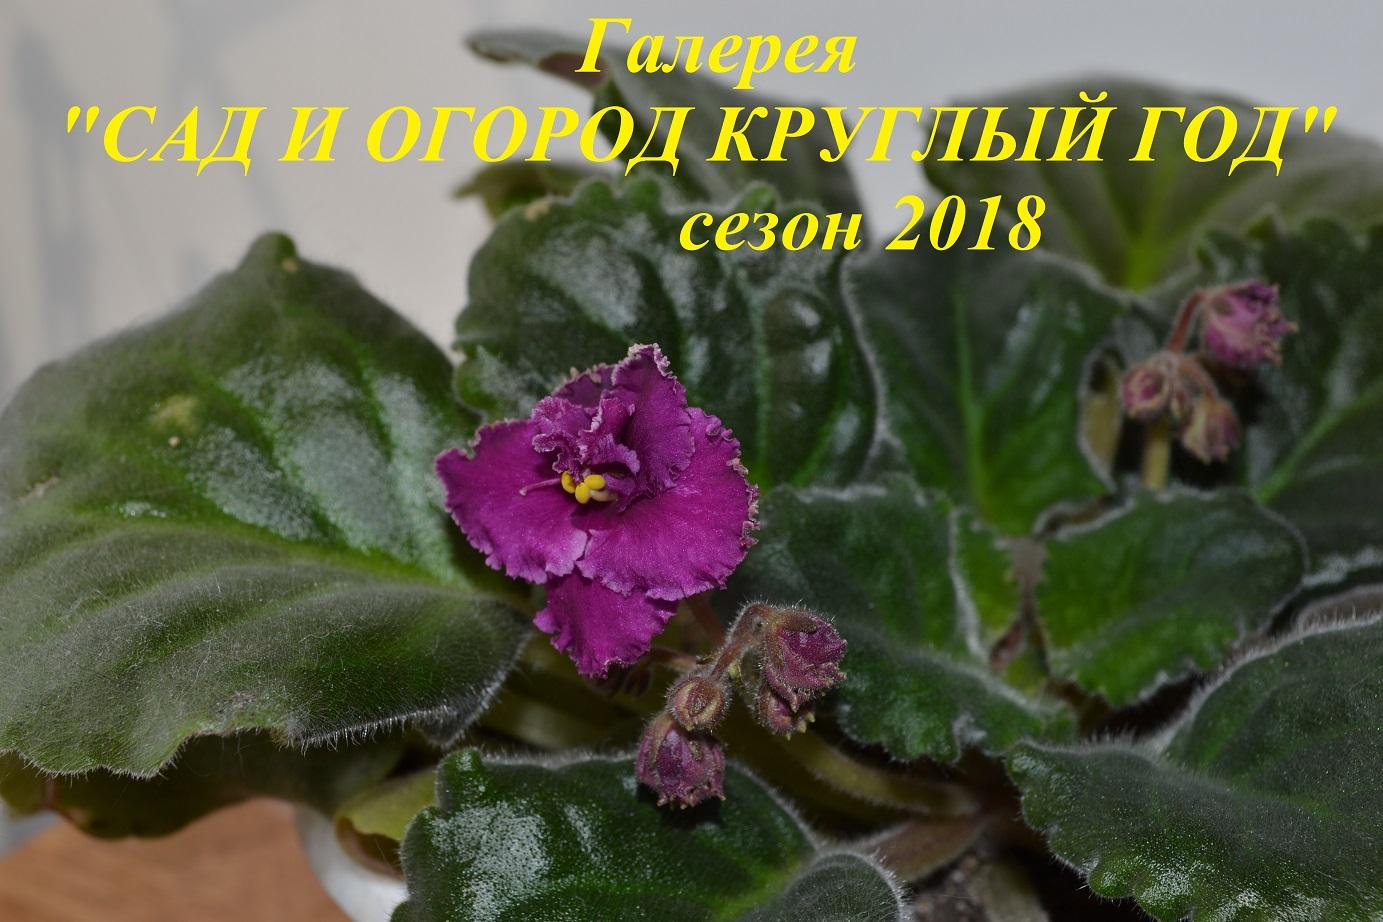 Сад и огород круглый год2018.